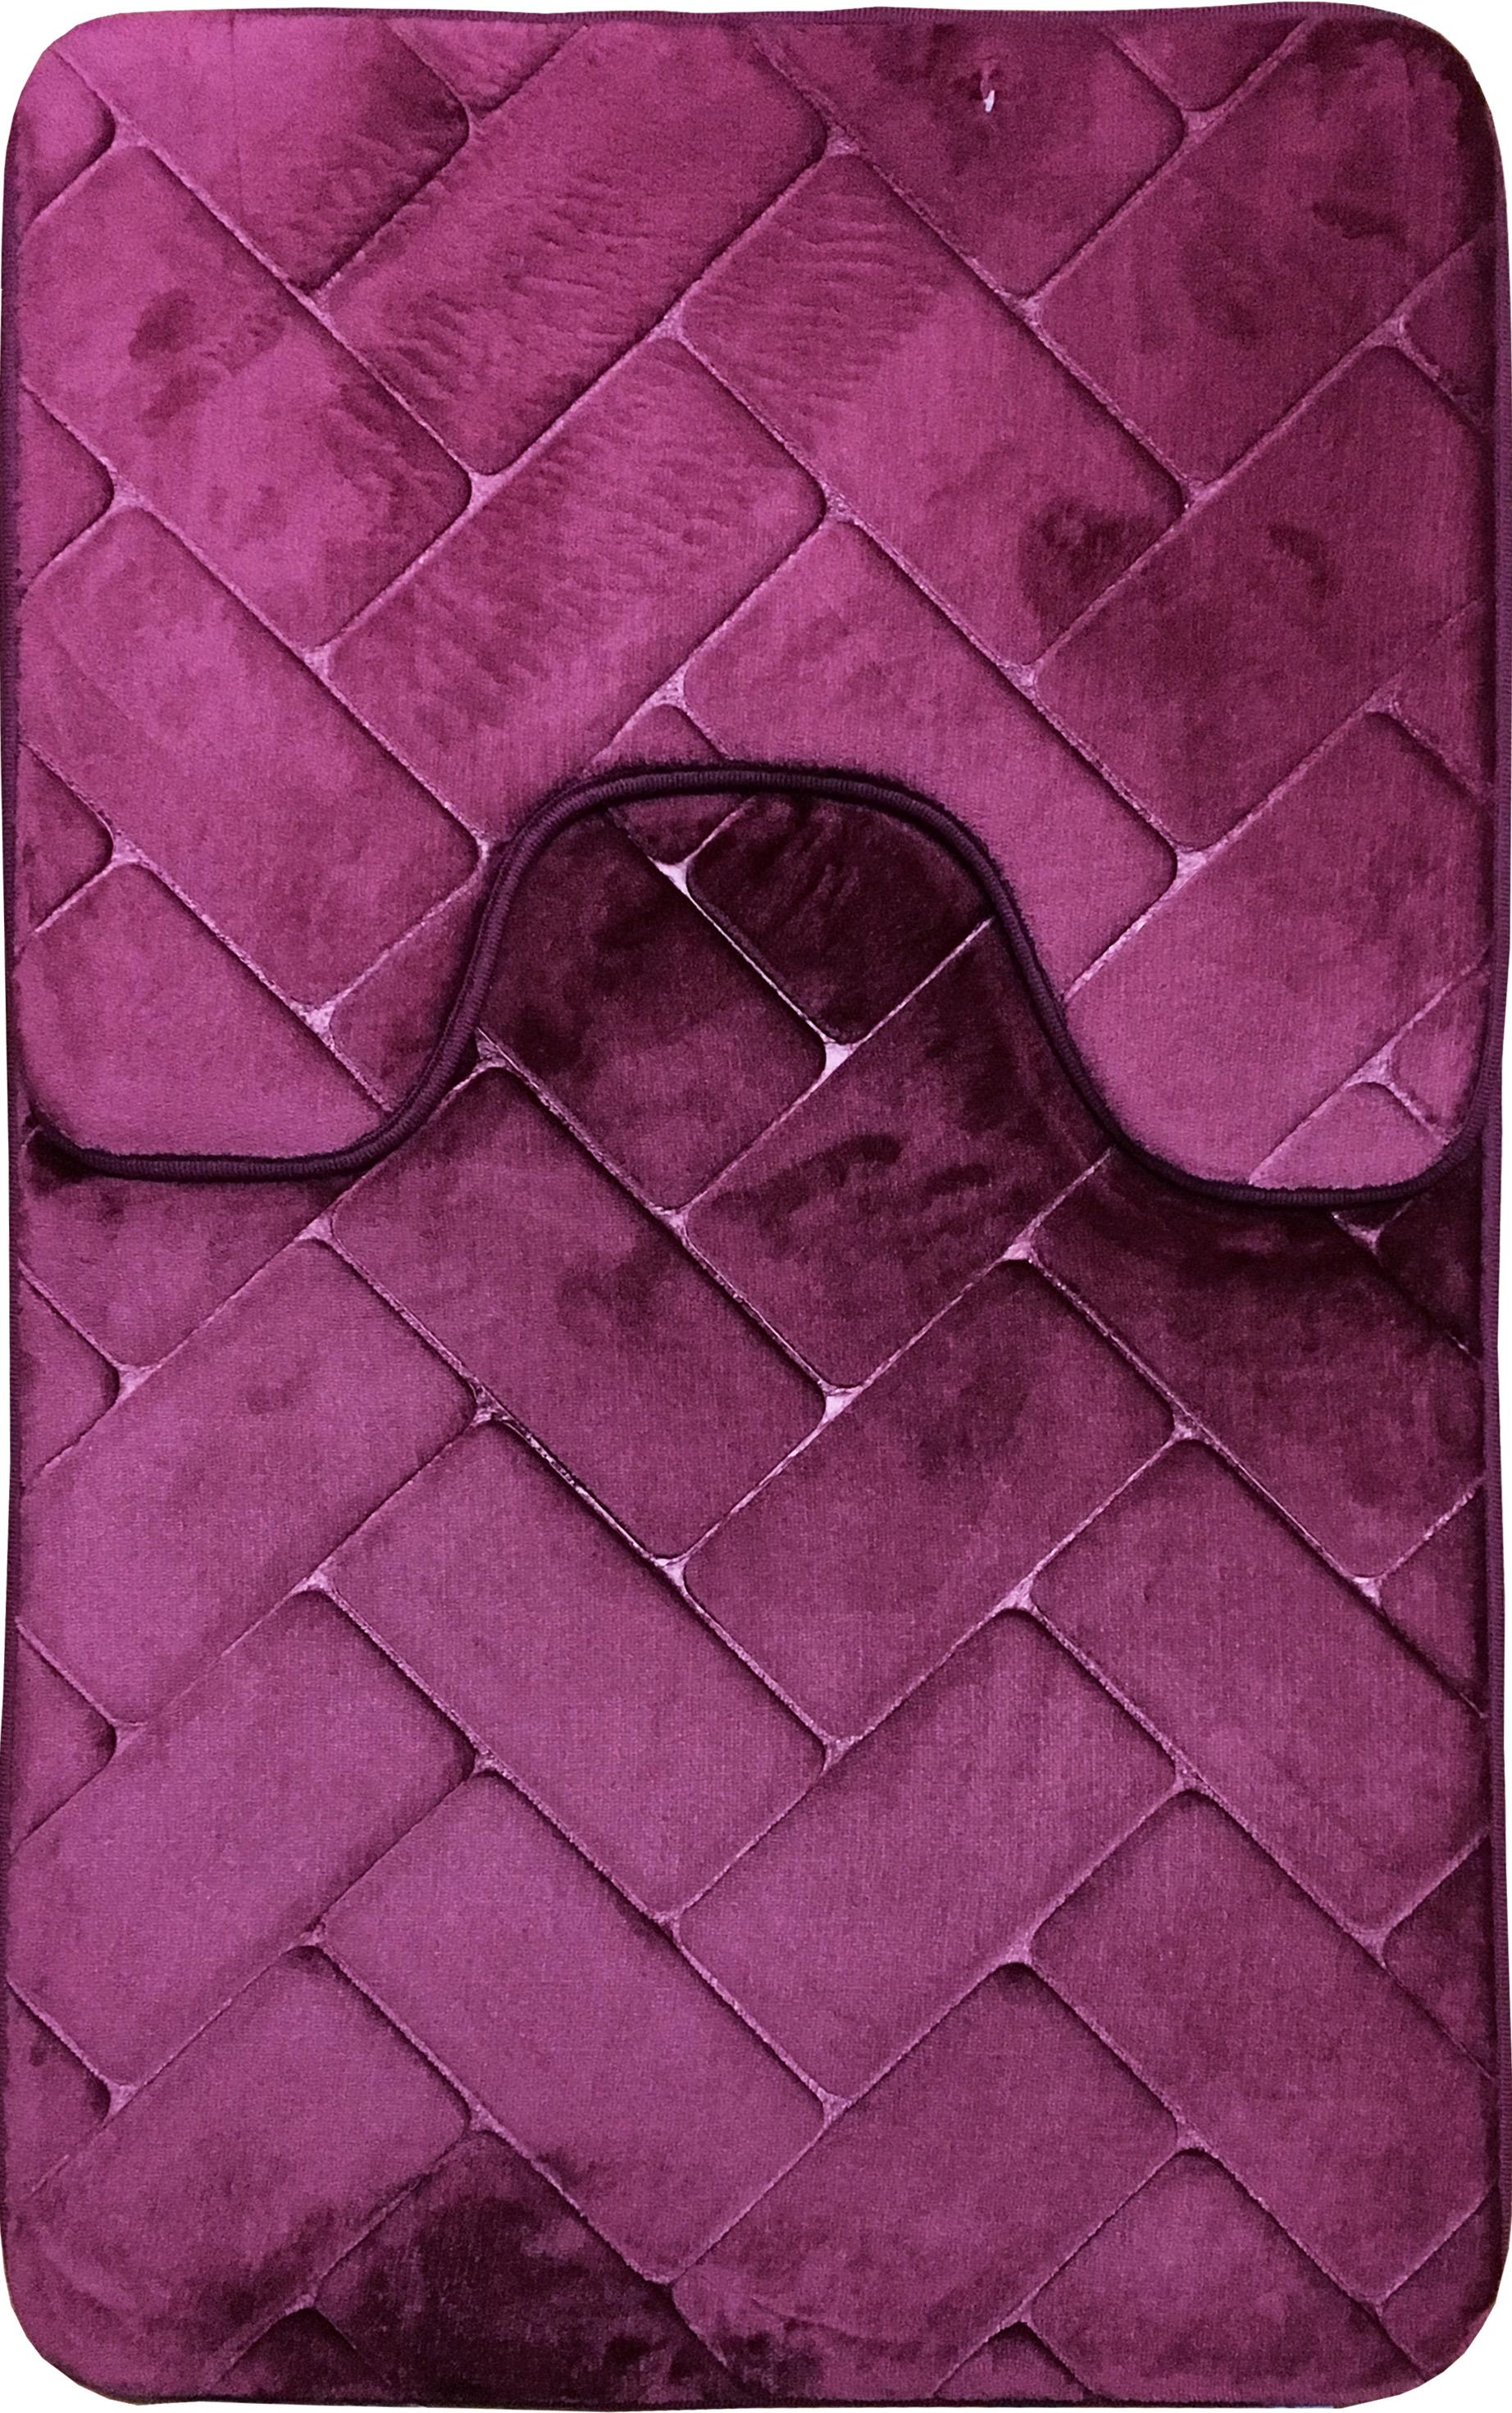 mats over on product rug radella free bedding shipping overstock mat stripe x bathtopia orders in bath purple microfiber